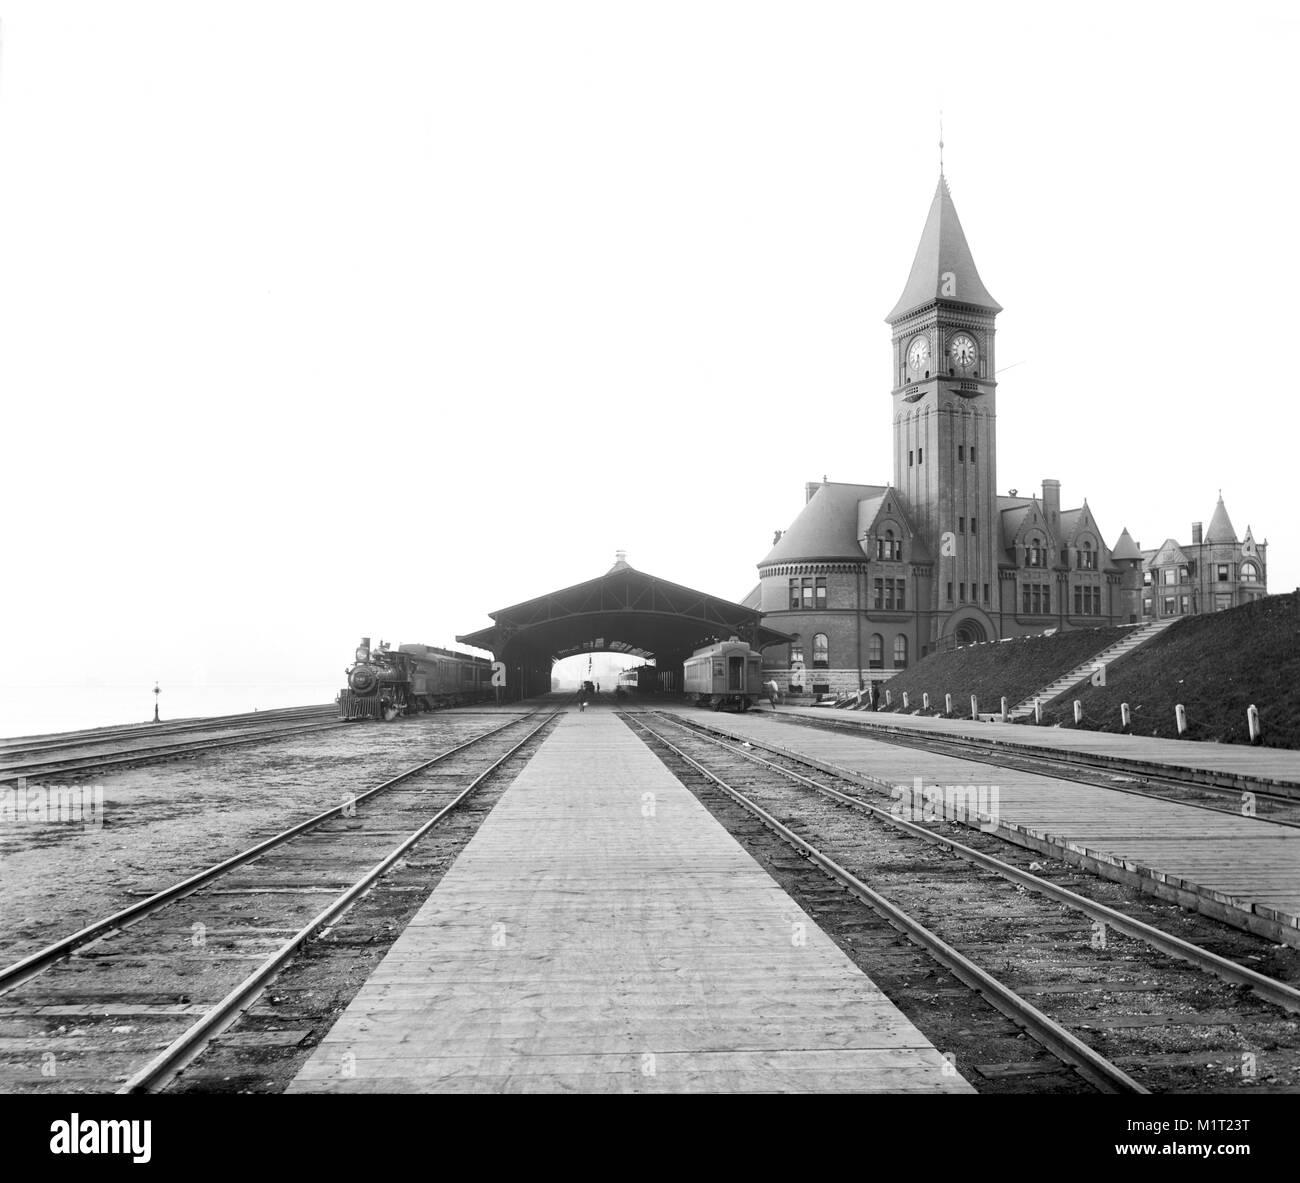 Chicago & North Western Railway Station, Milwaukee, Wisconsin, USA, Detroit Publishing Company, 1890 Immagini Stock